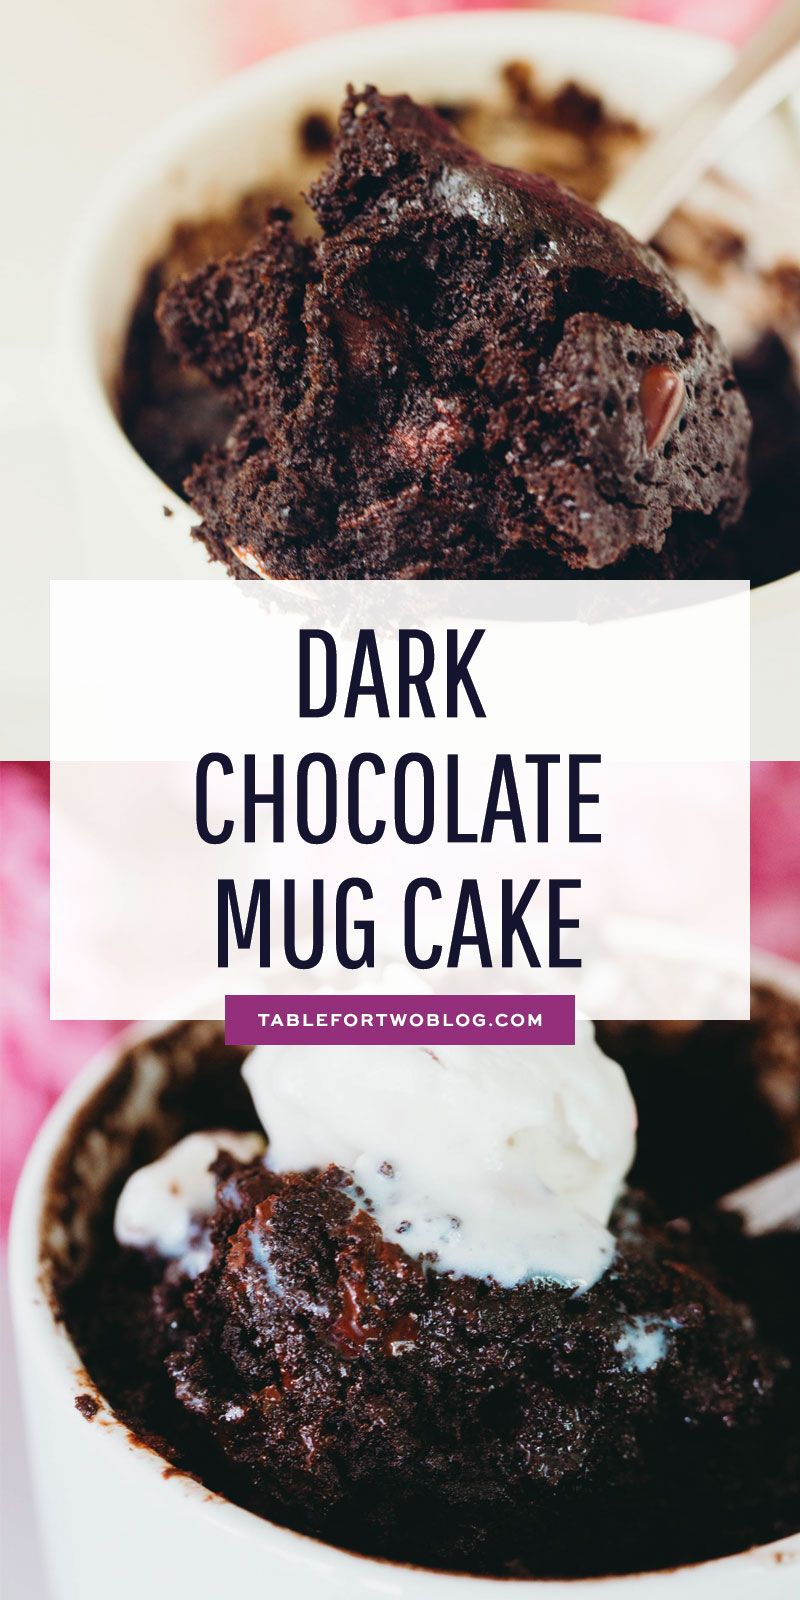 Dark Chocolate Mug Cake - Mug Cake for One or Two - No Eggs!